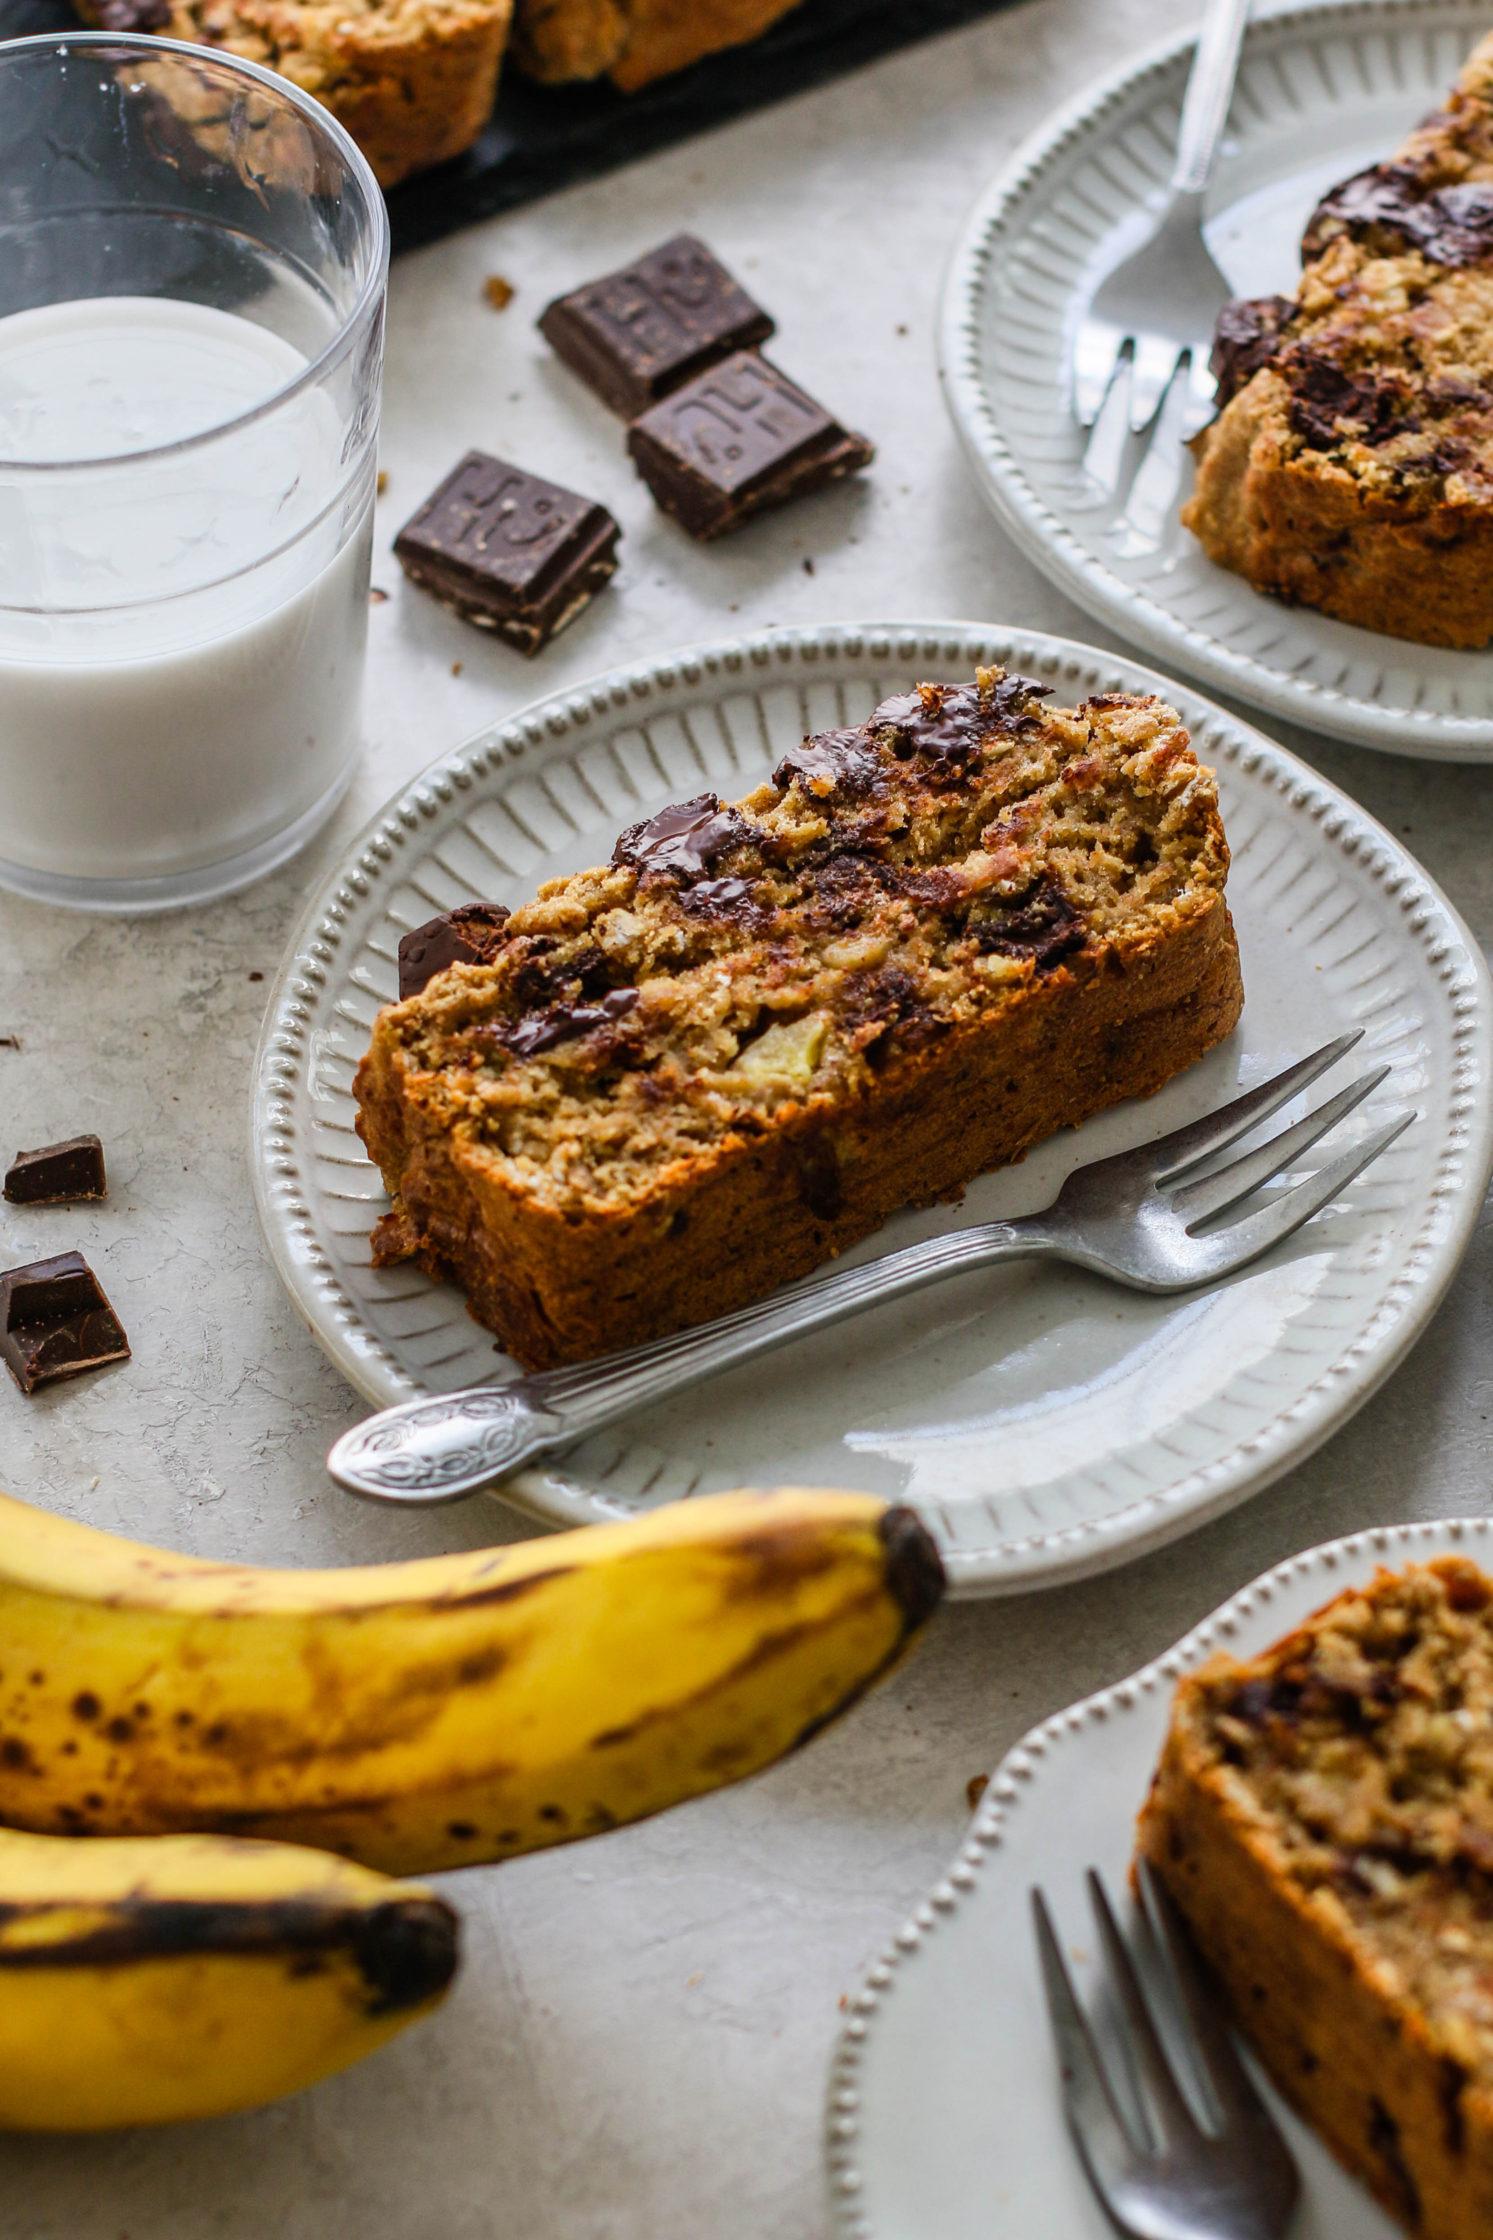 Vegan & GF Banana Chocolate Chunk Bread by Flora & Vino